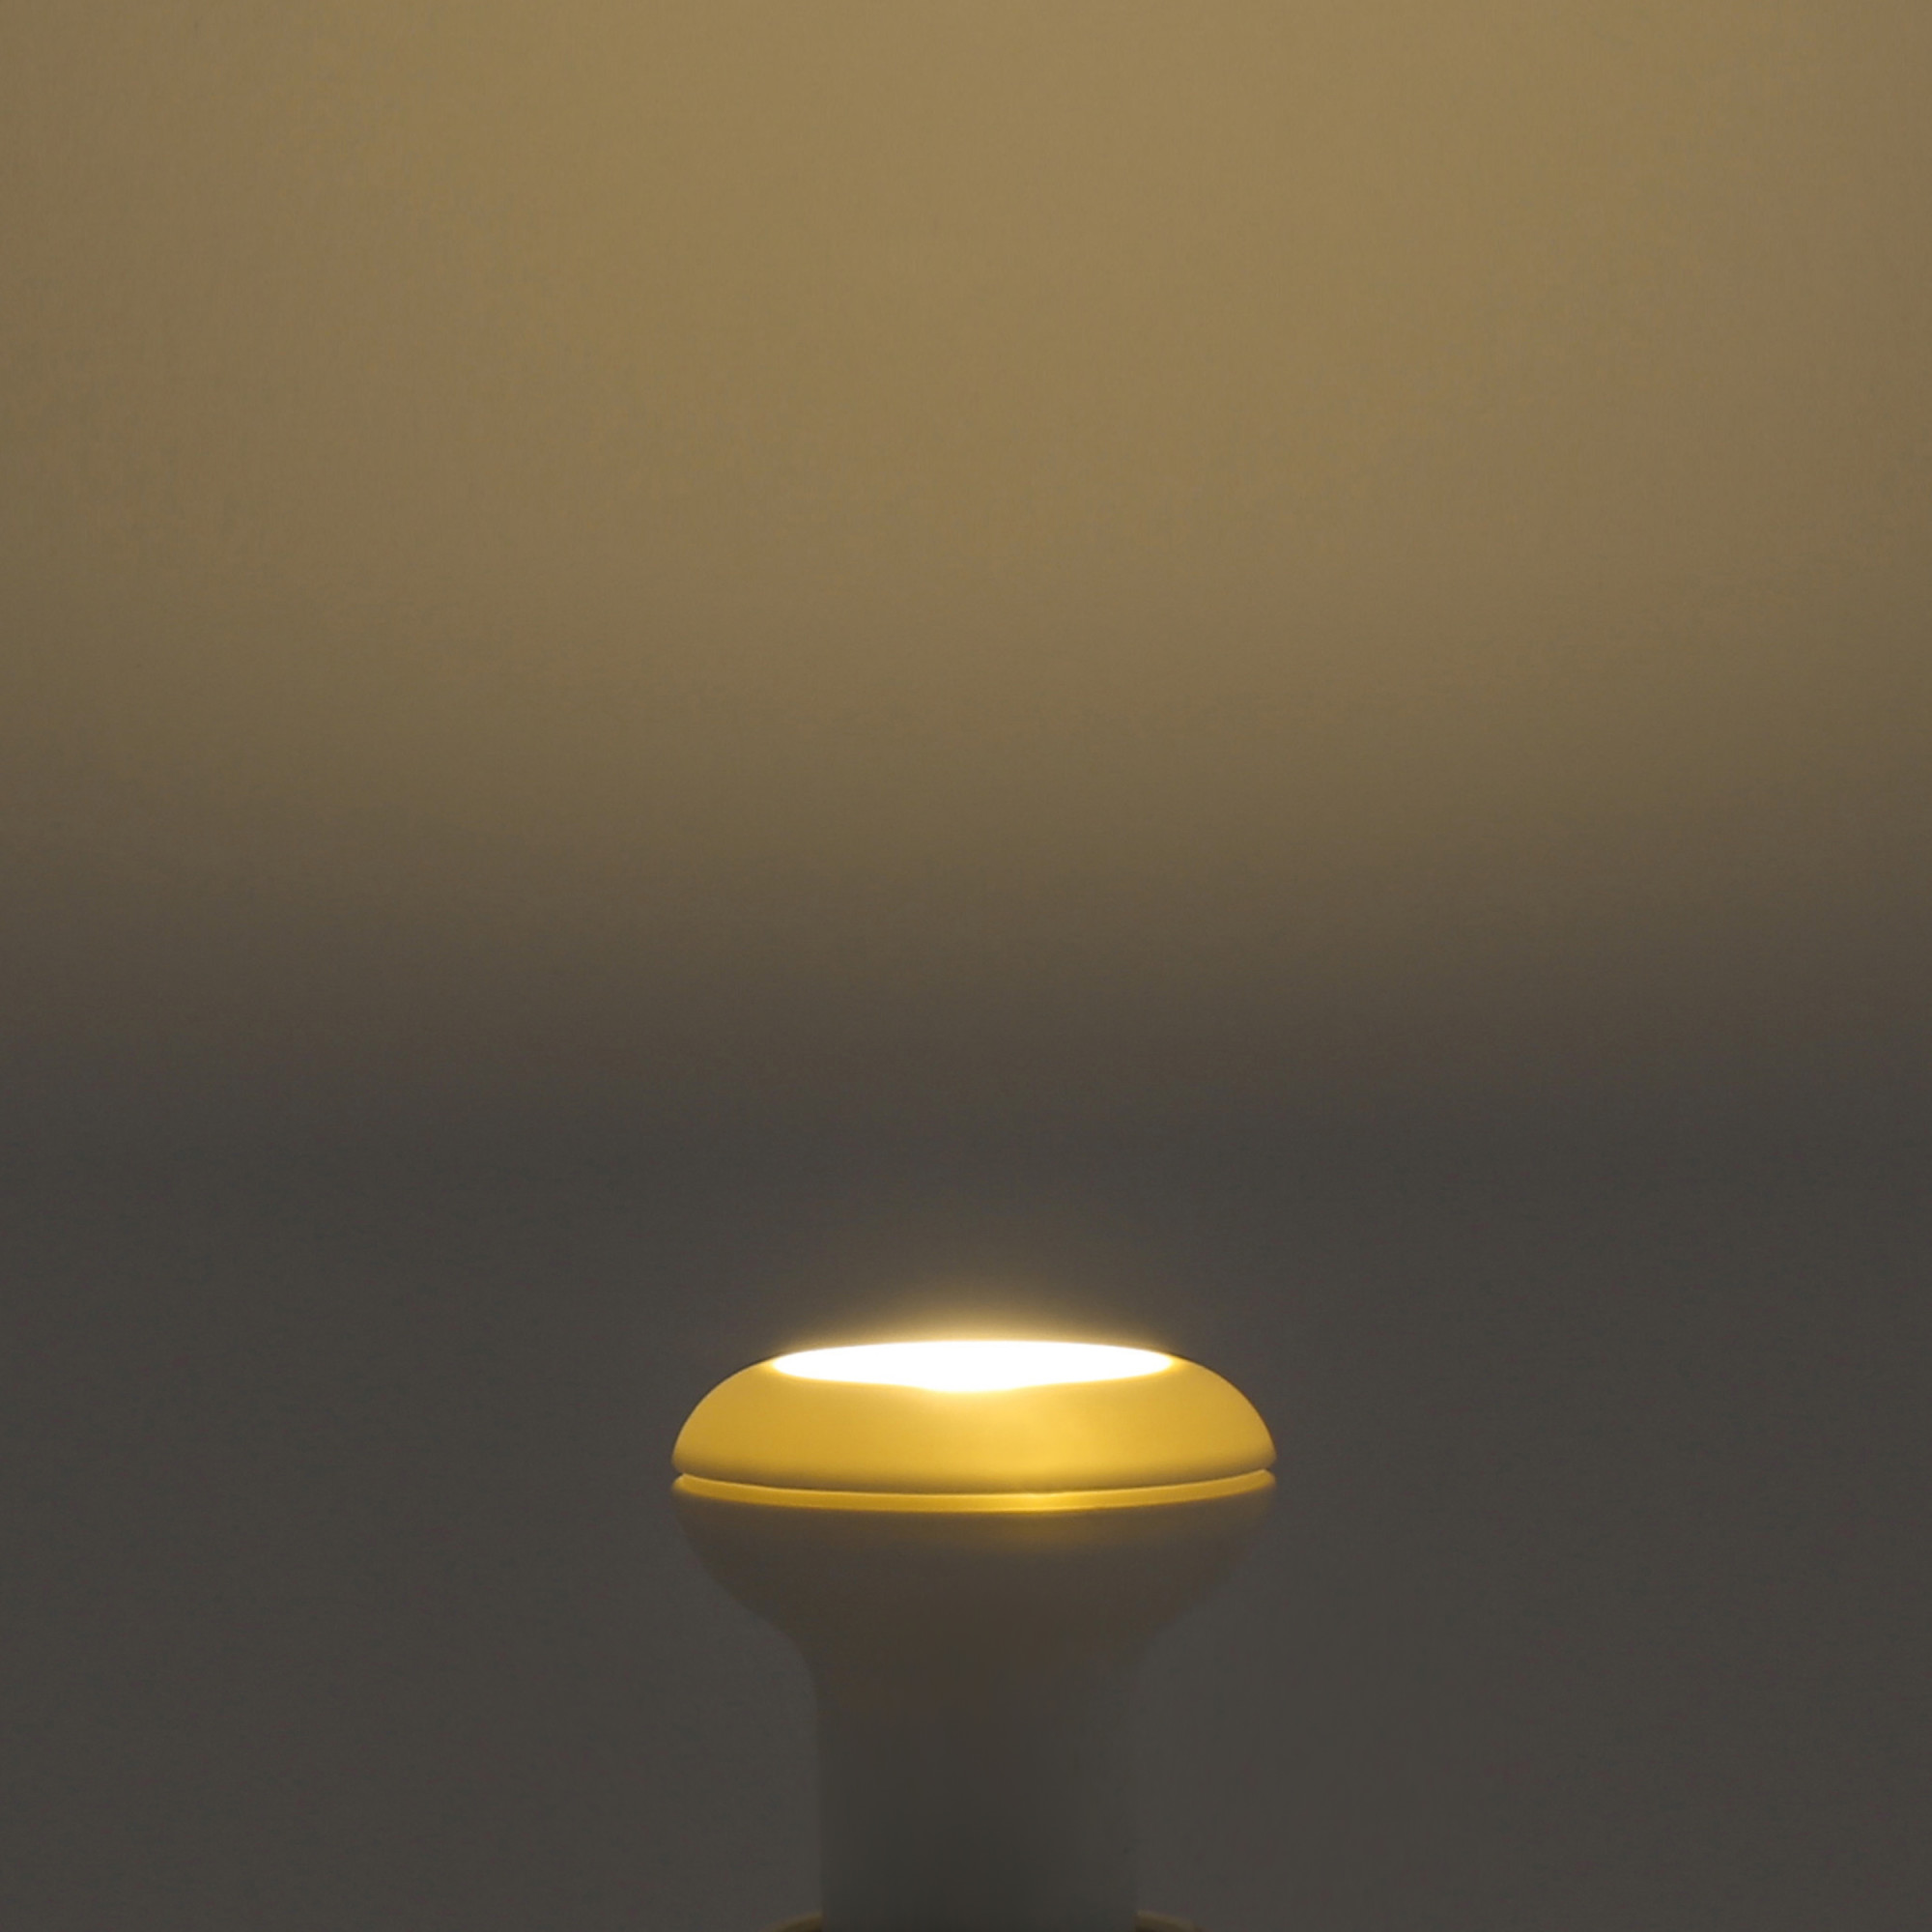 Лампа светодиодная Lexman E14 25 Вт 196 Лм 2700 K свет тёплый белый